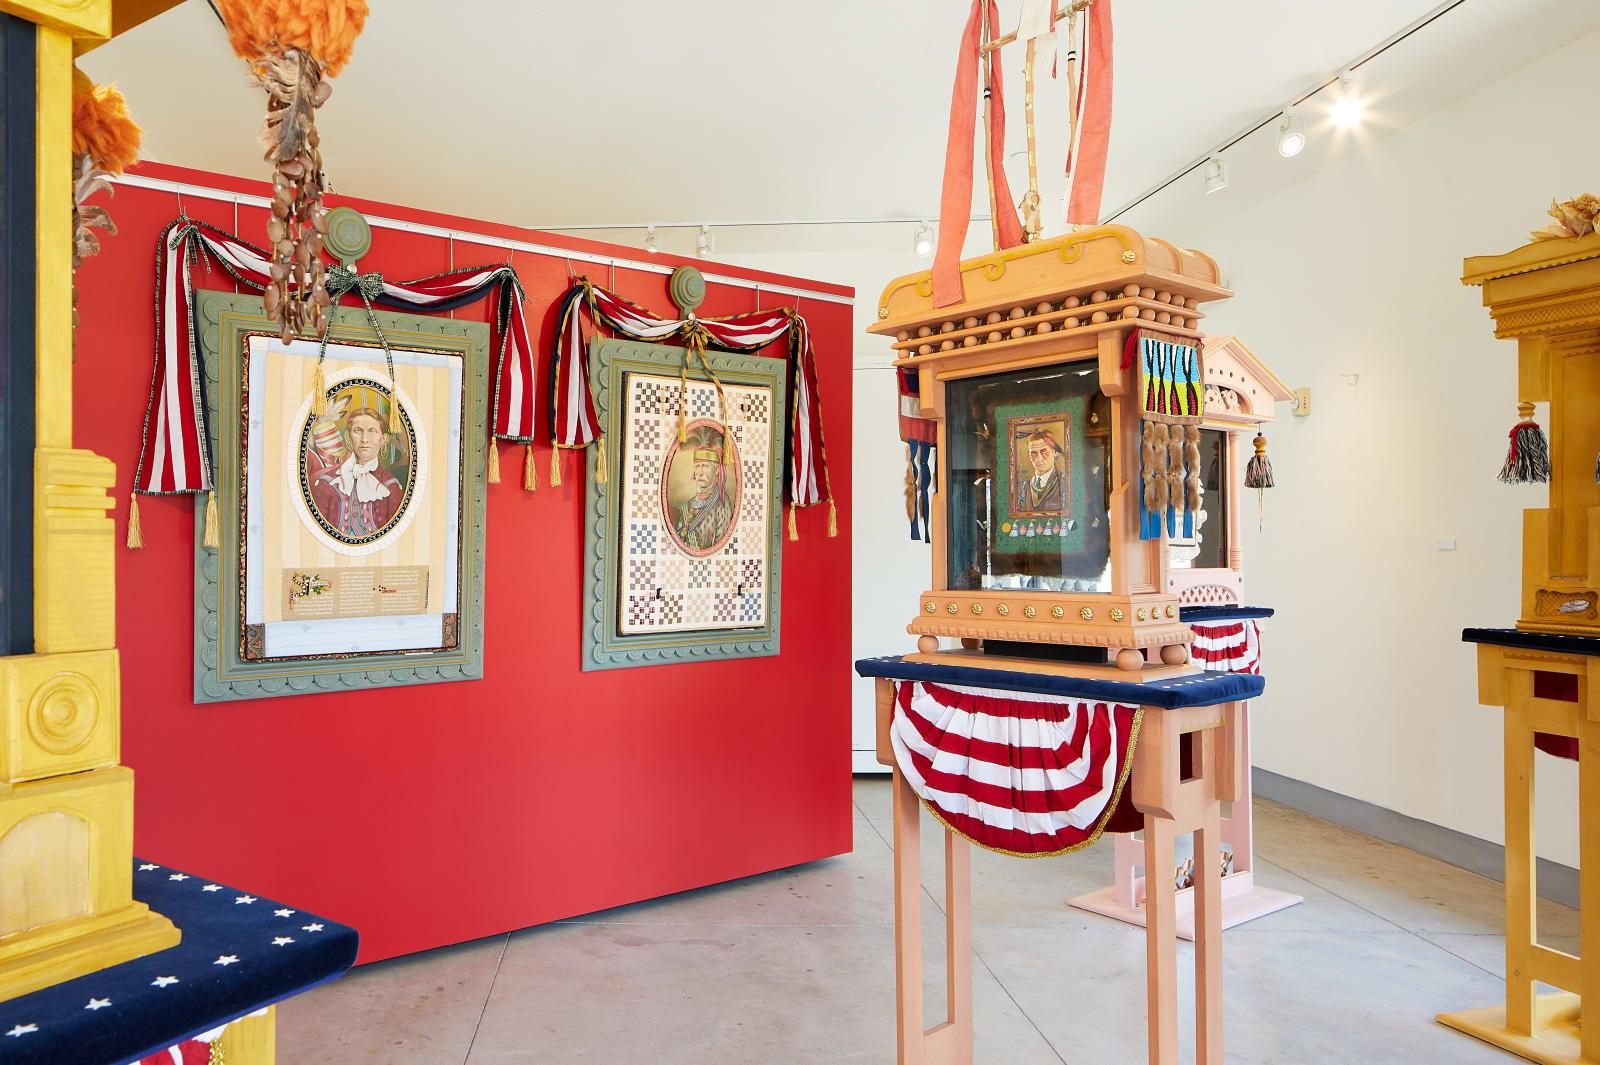 Tamara Burgh installation view